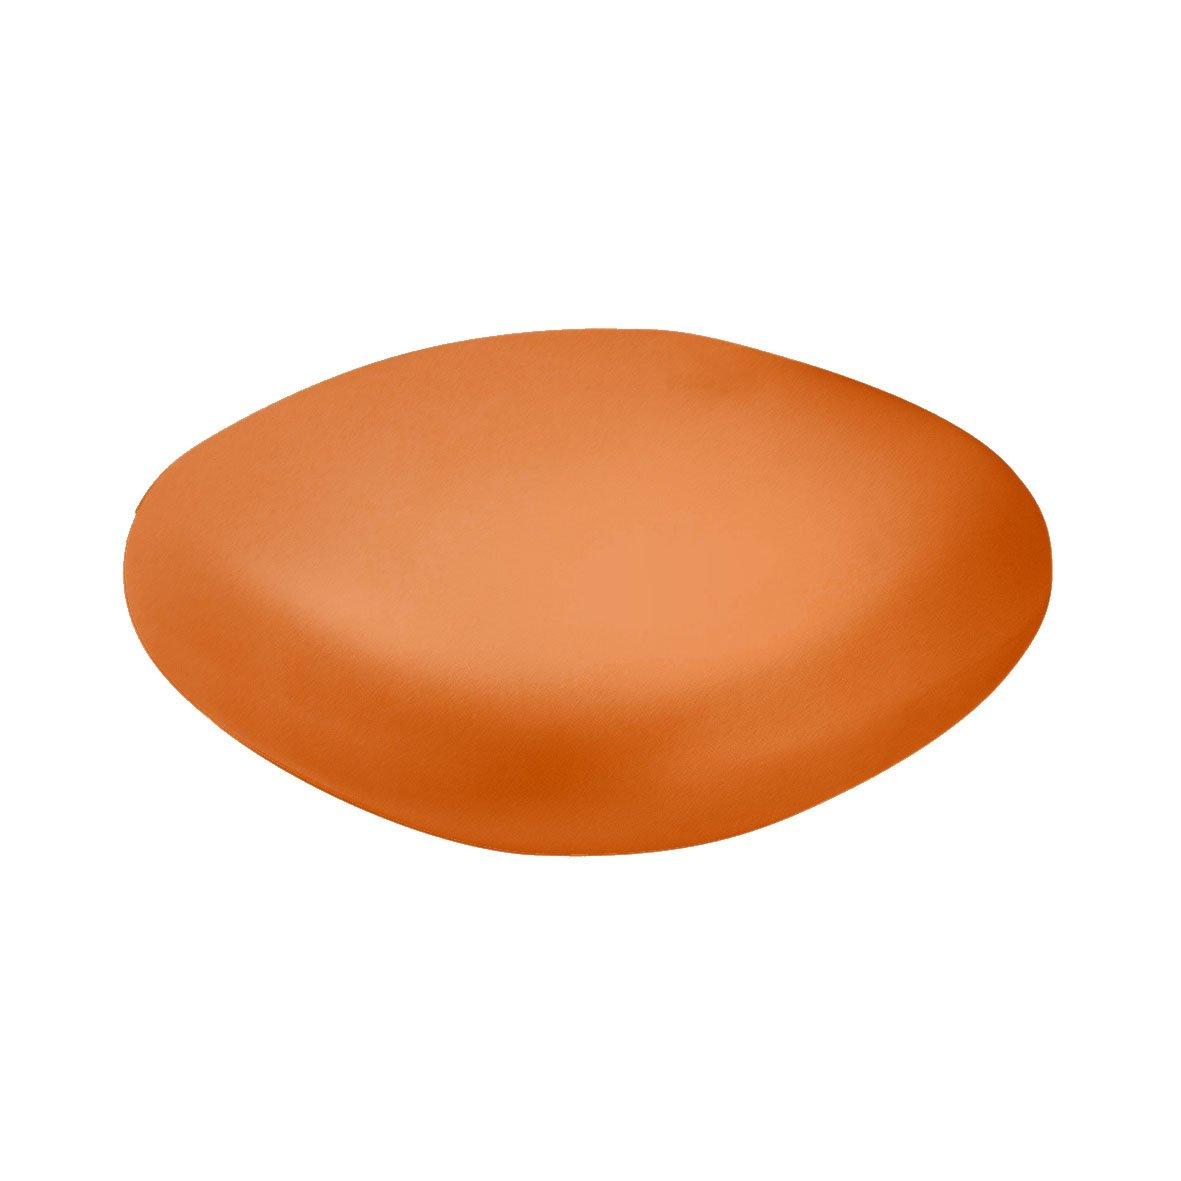 Slide Chubby Low Pouf - Small table Pumpkin Orange